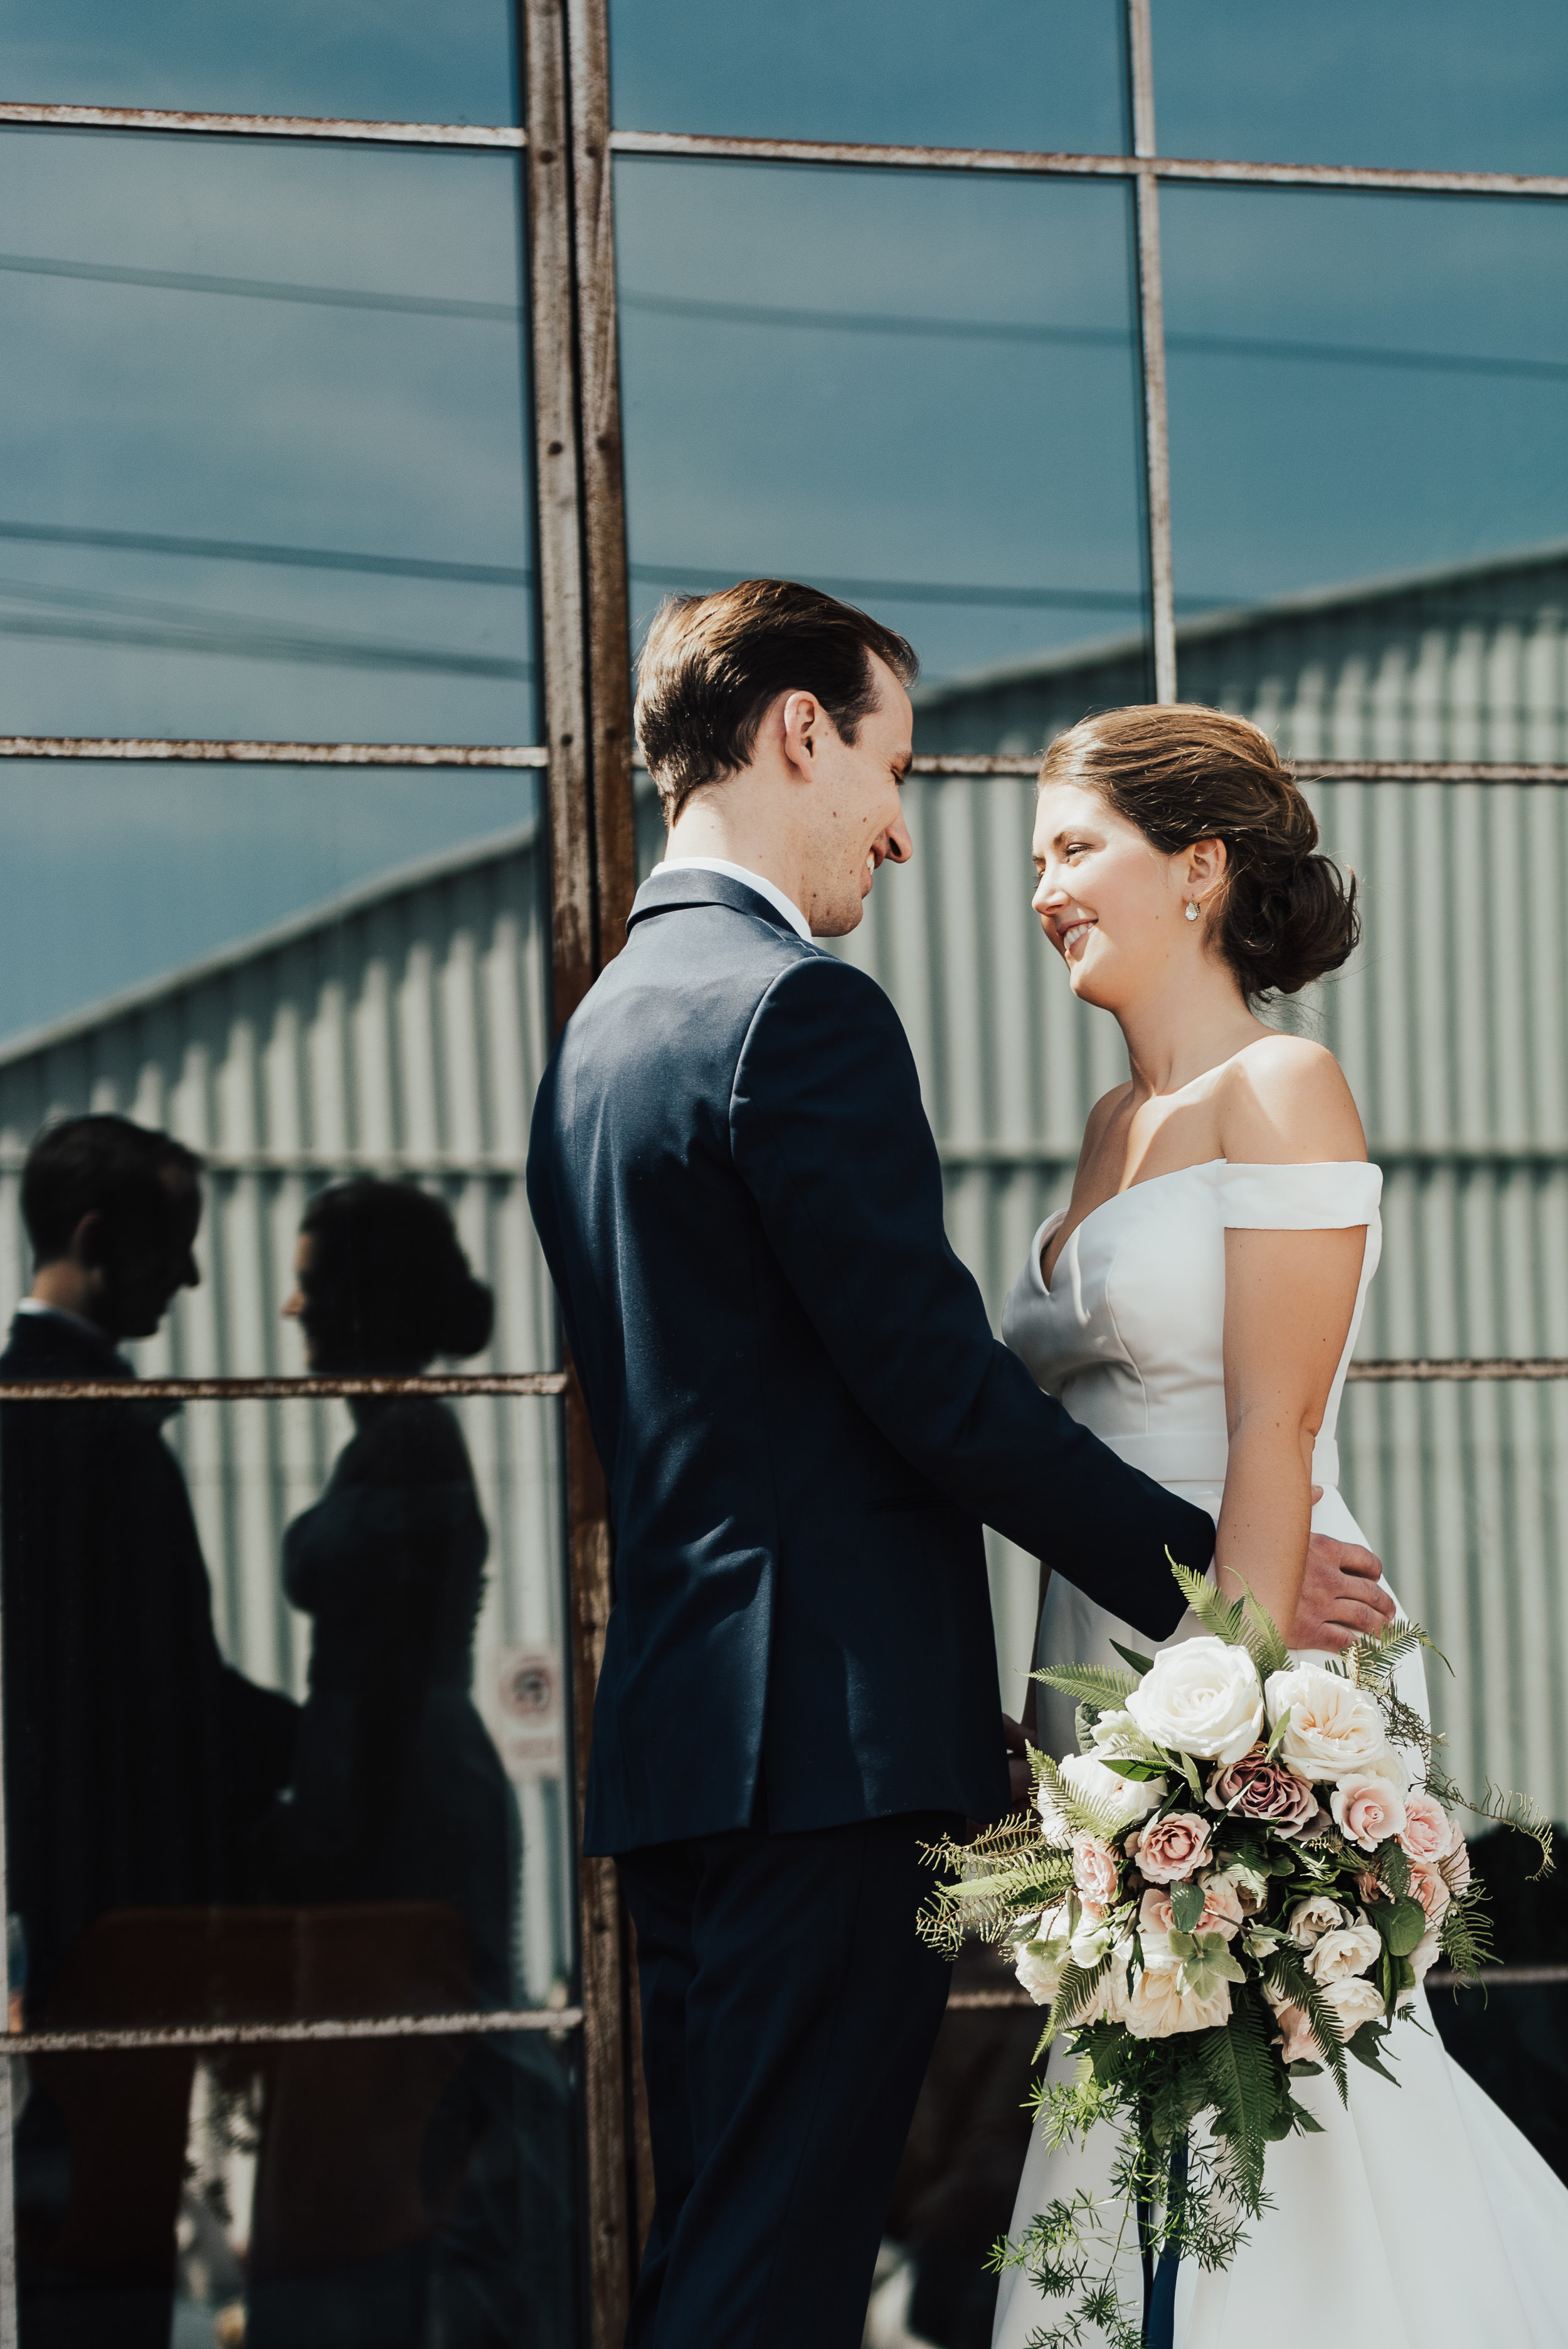 Solar-Arts-Wedding-Minneapolis-Steena-Anne-Photography16.jpg